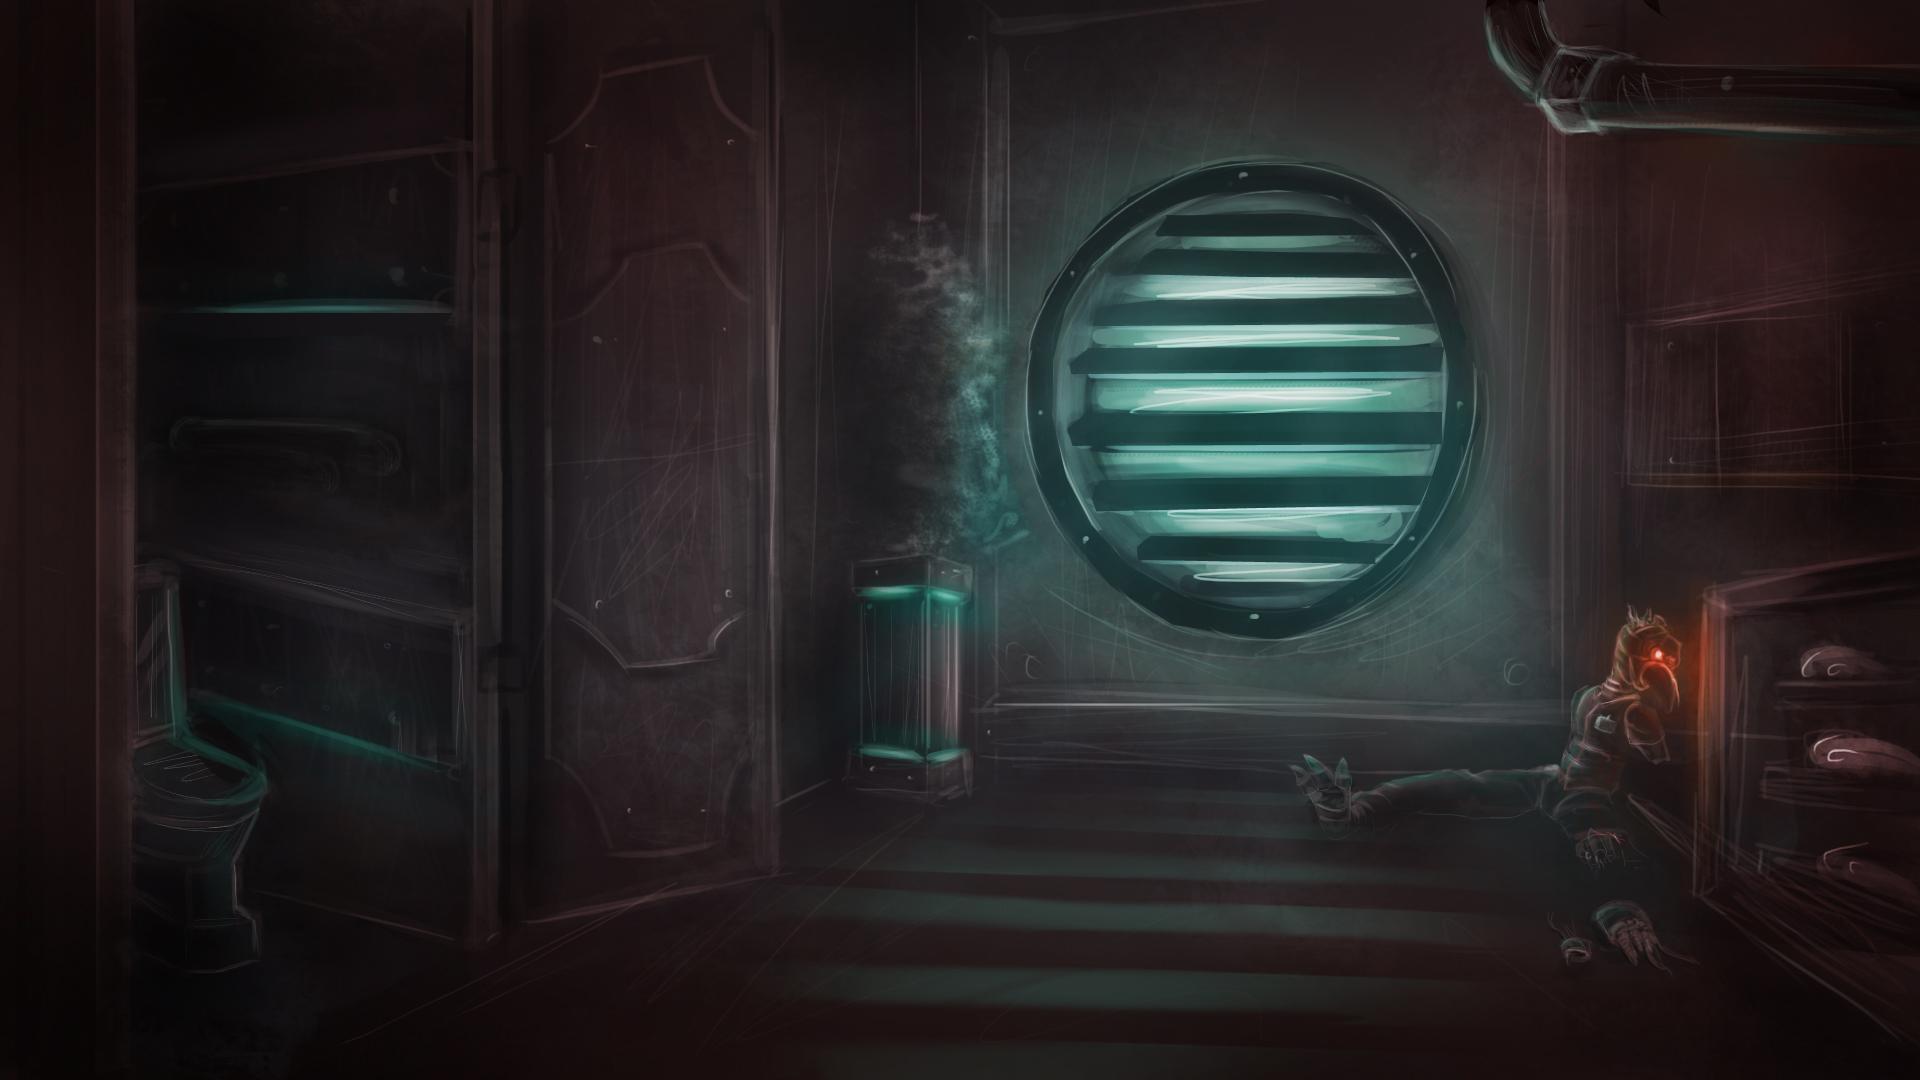 Sci Fi Environment Concept by MakingMeNervous on DeviantArt